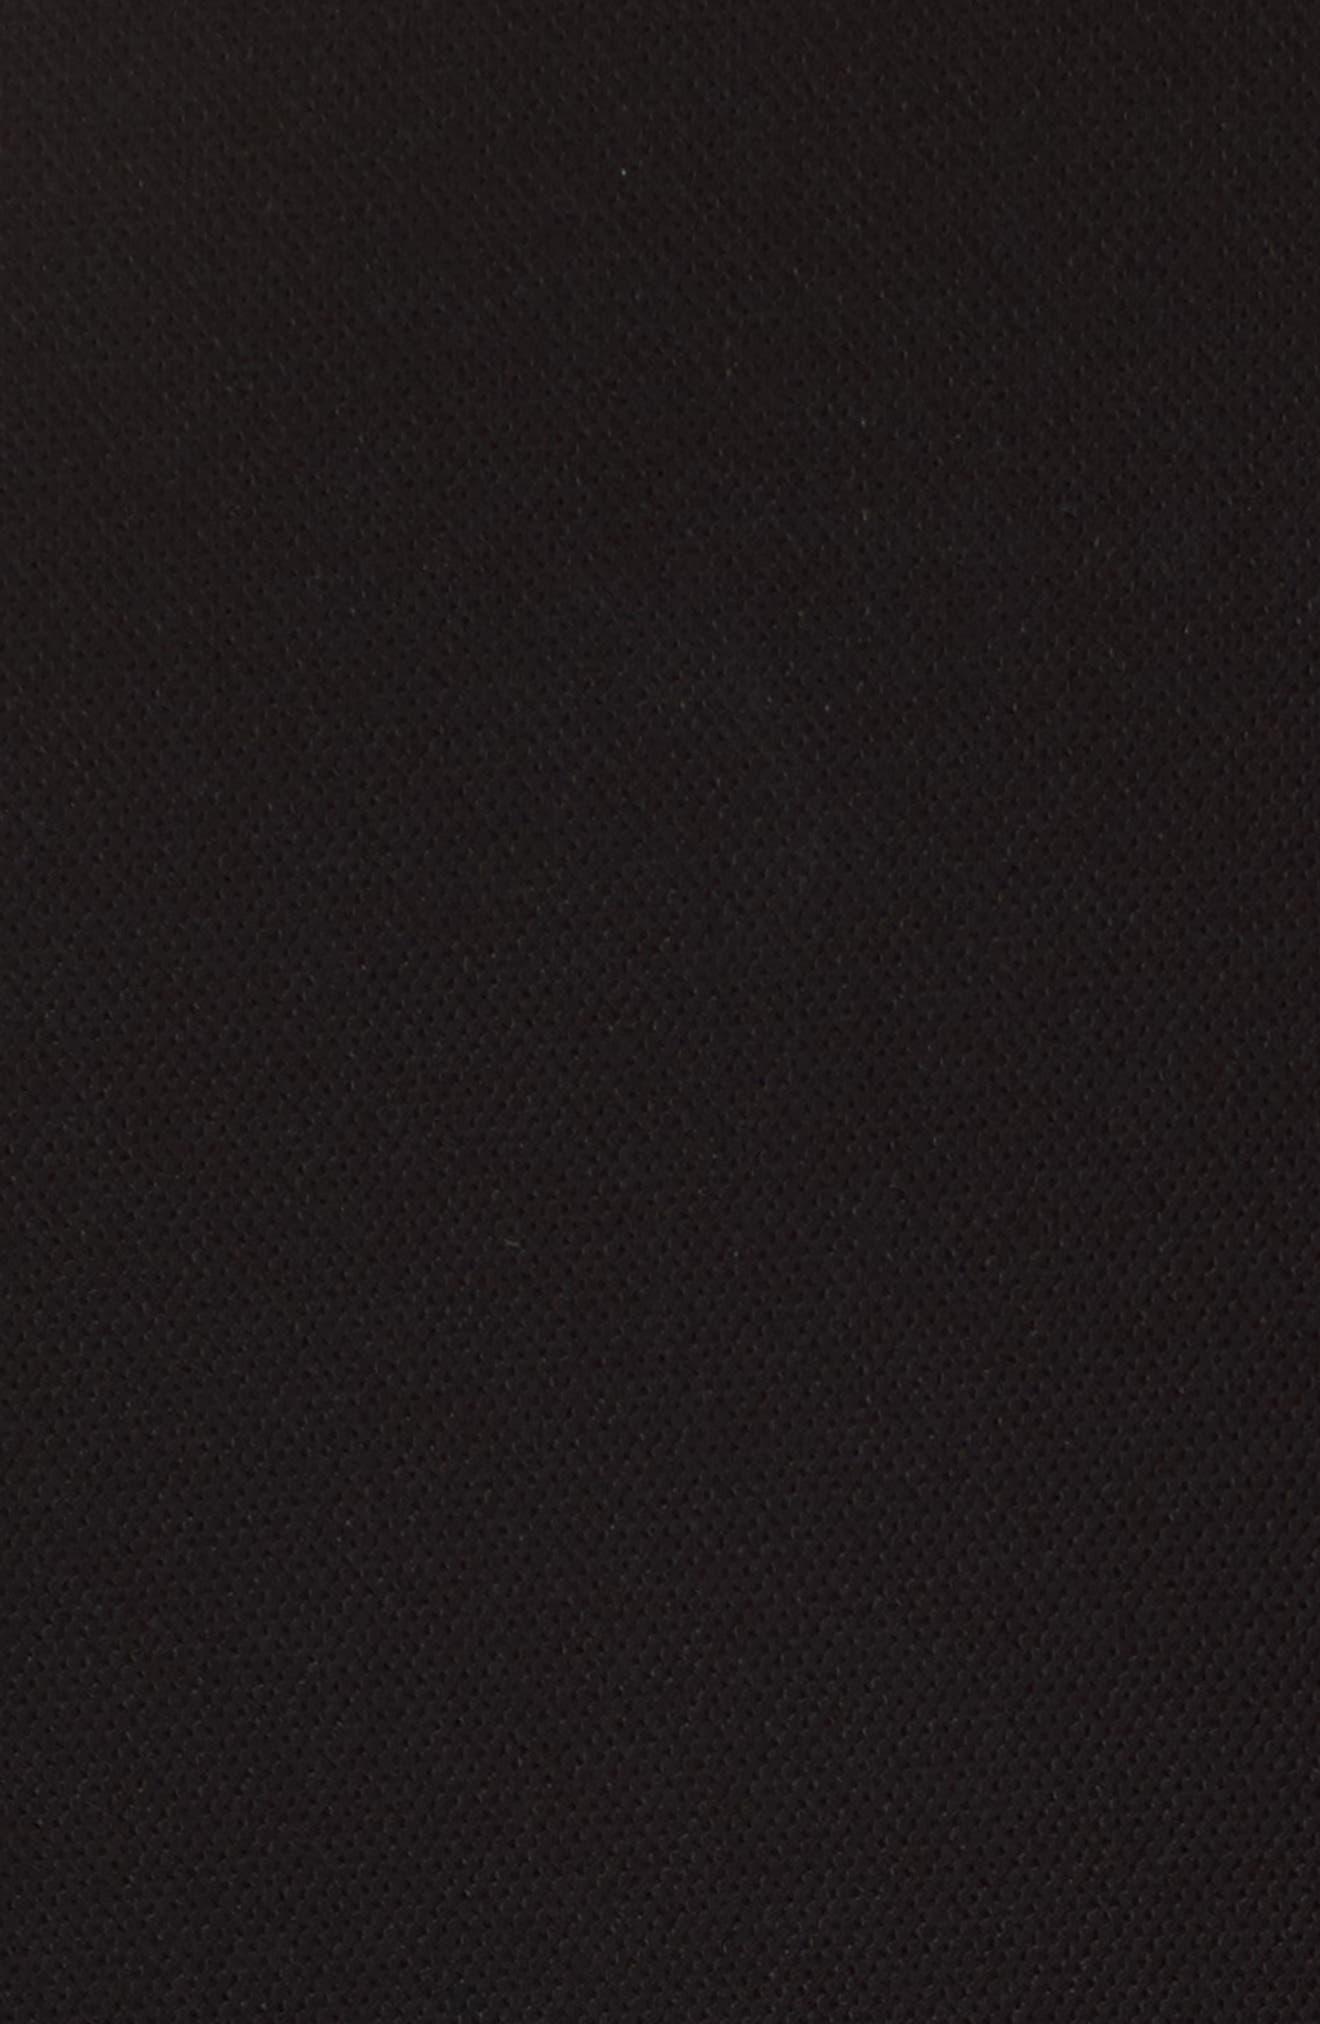 Hugo Boss Juwimea Blazer,                             Alternate thumbnail 6, color,                             Black